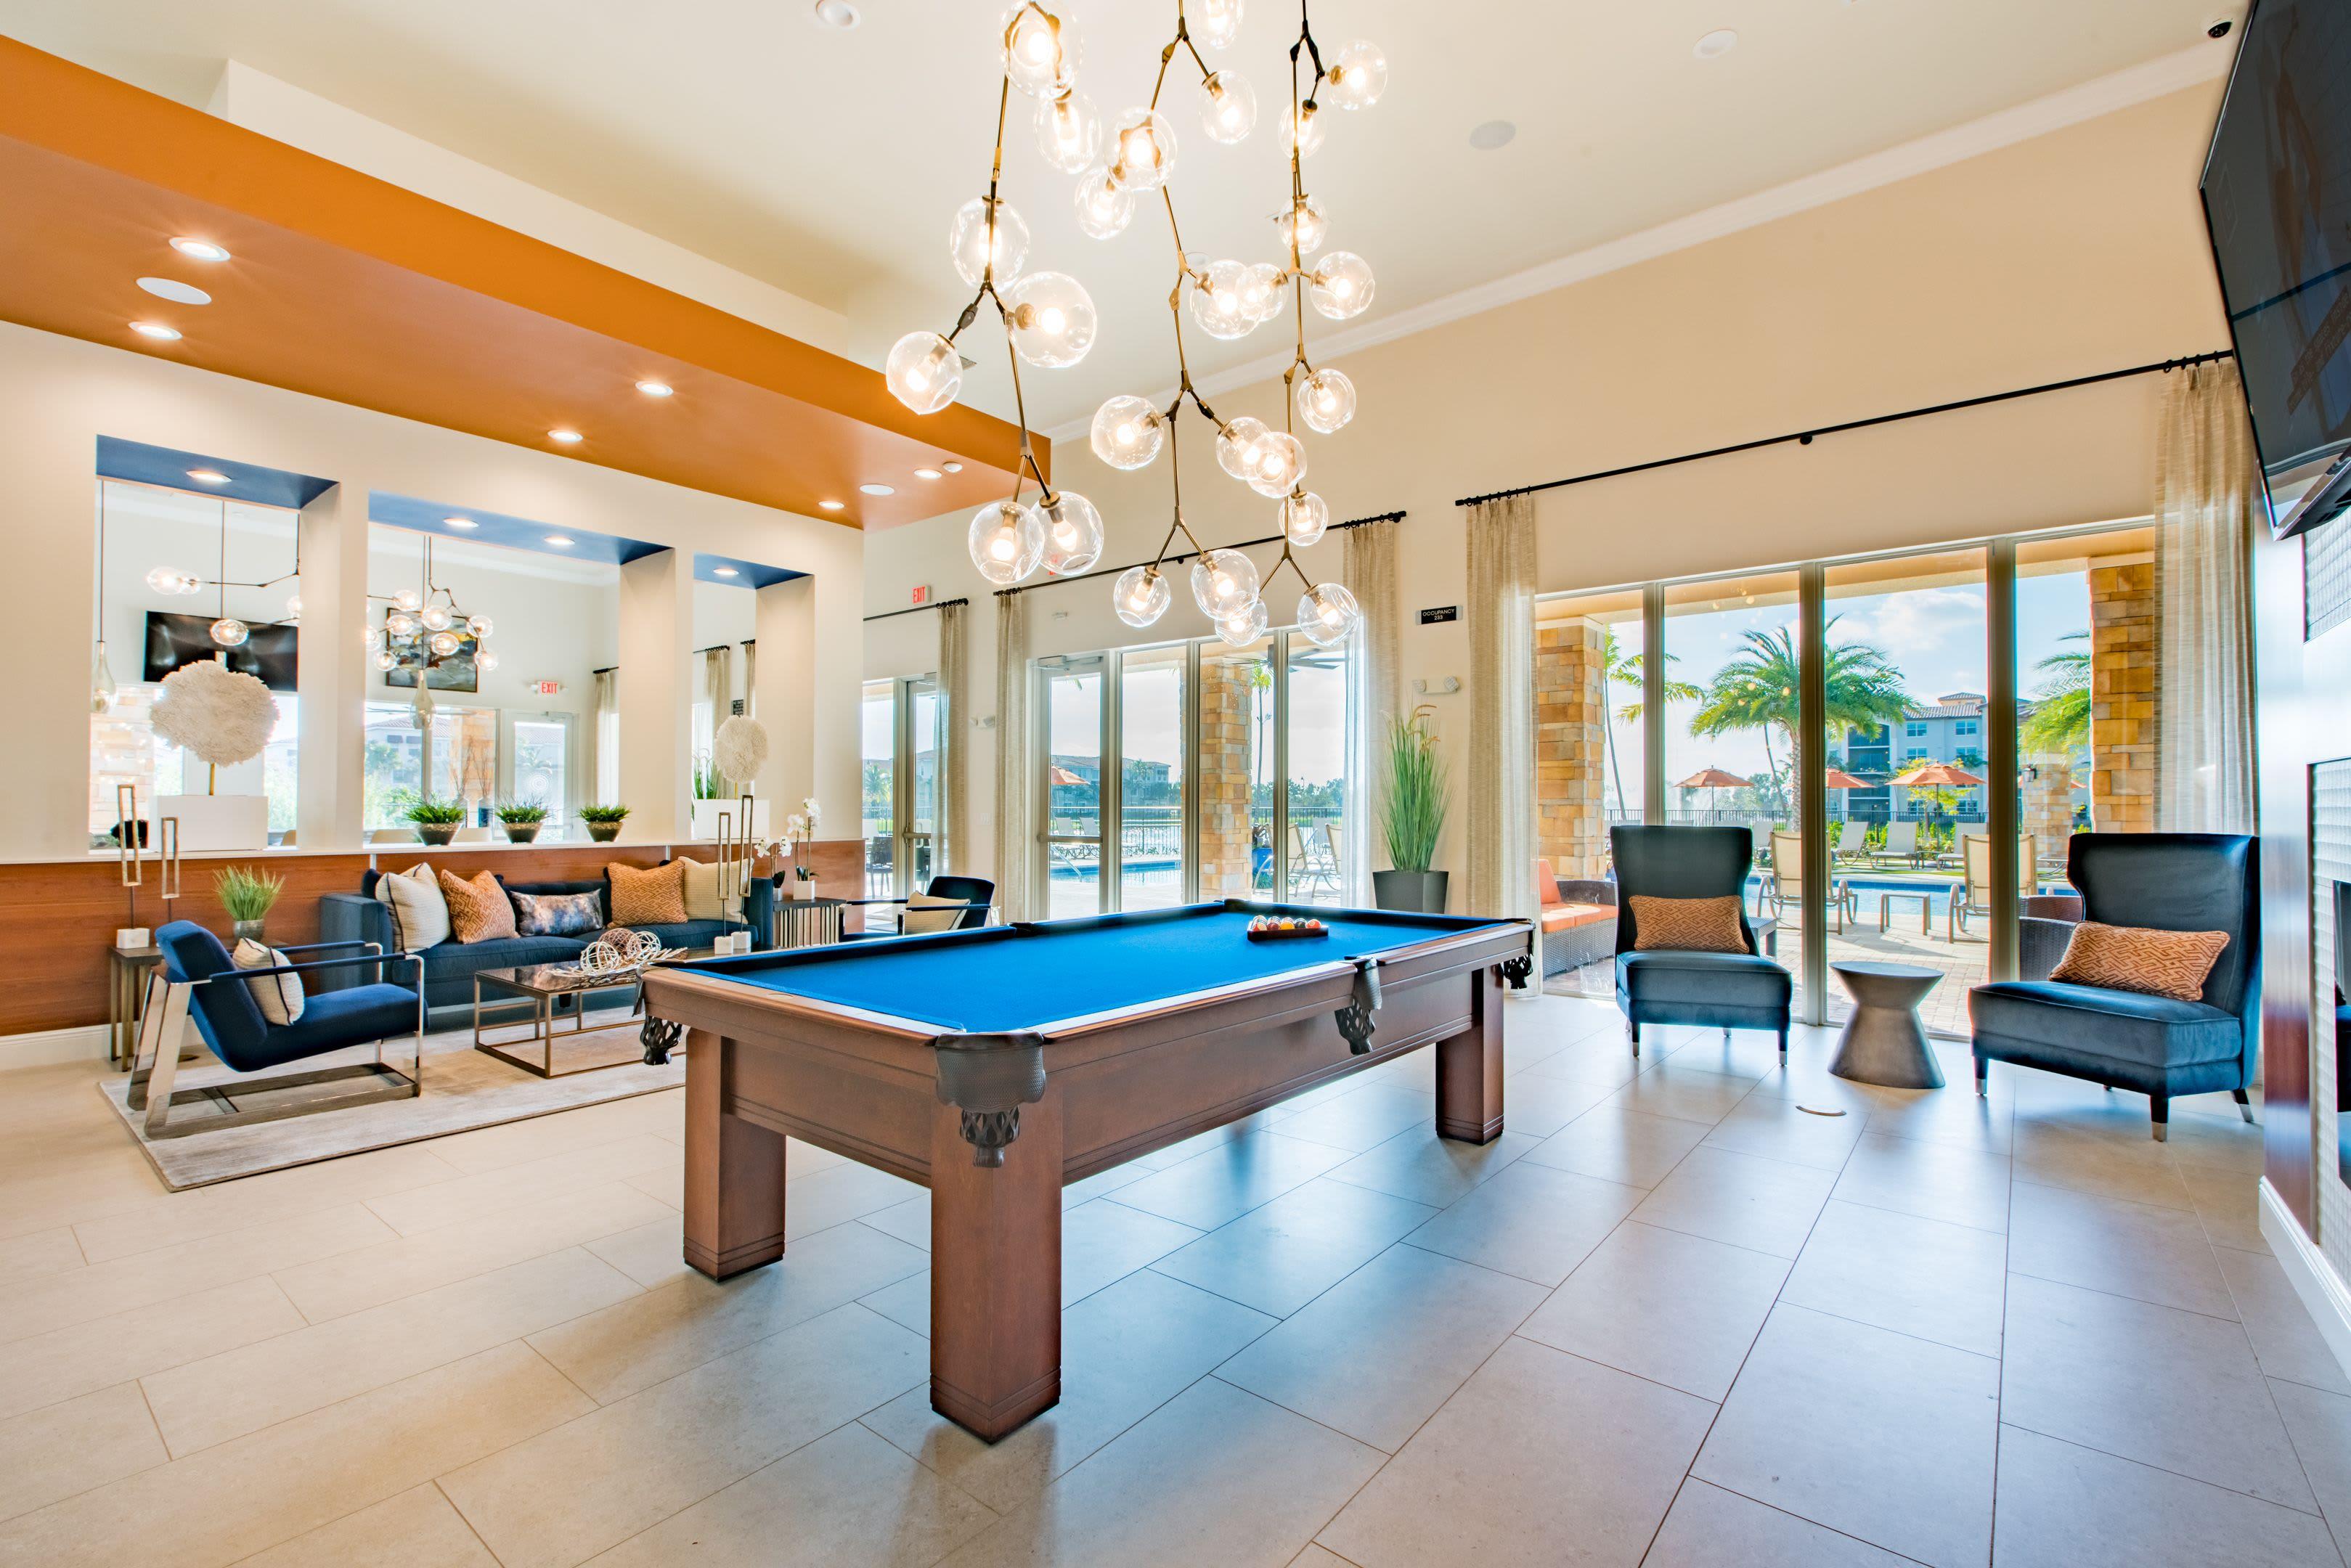 Resident Lounge & Billiards at Luma Miramar Apartments in Miramar, Florida.